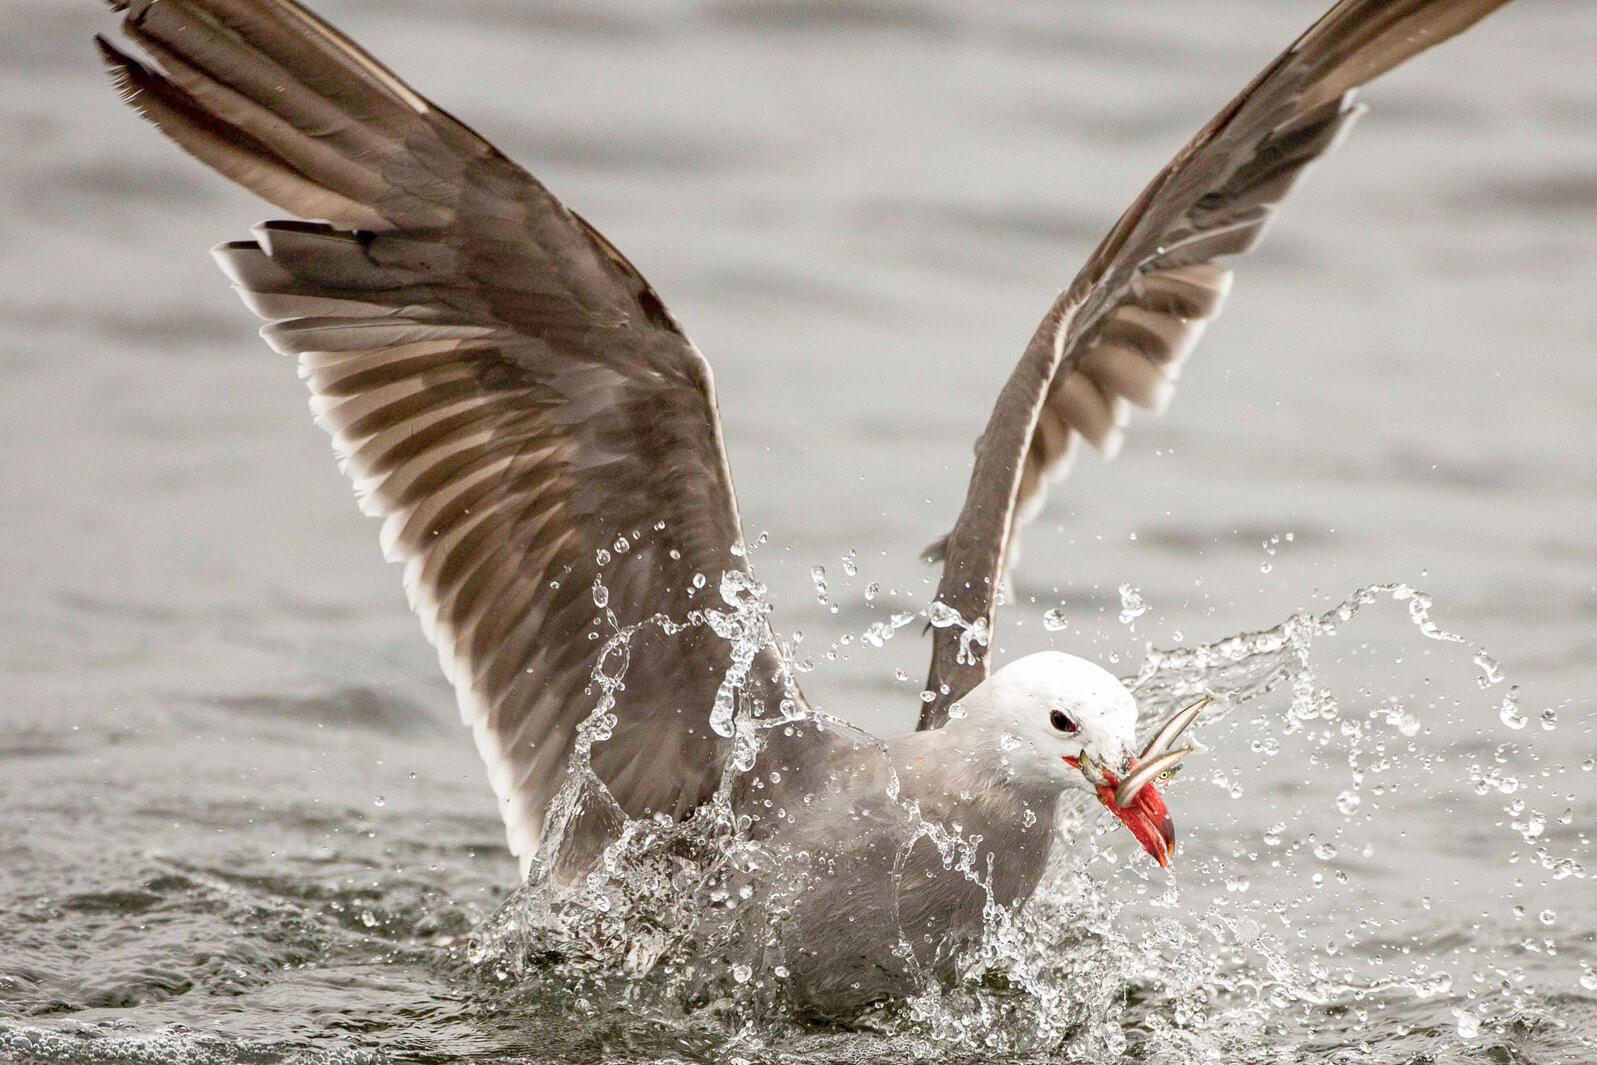 Heermann's Gull. Janine Schutt/Audubon Photography Awards